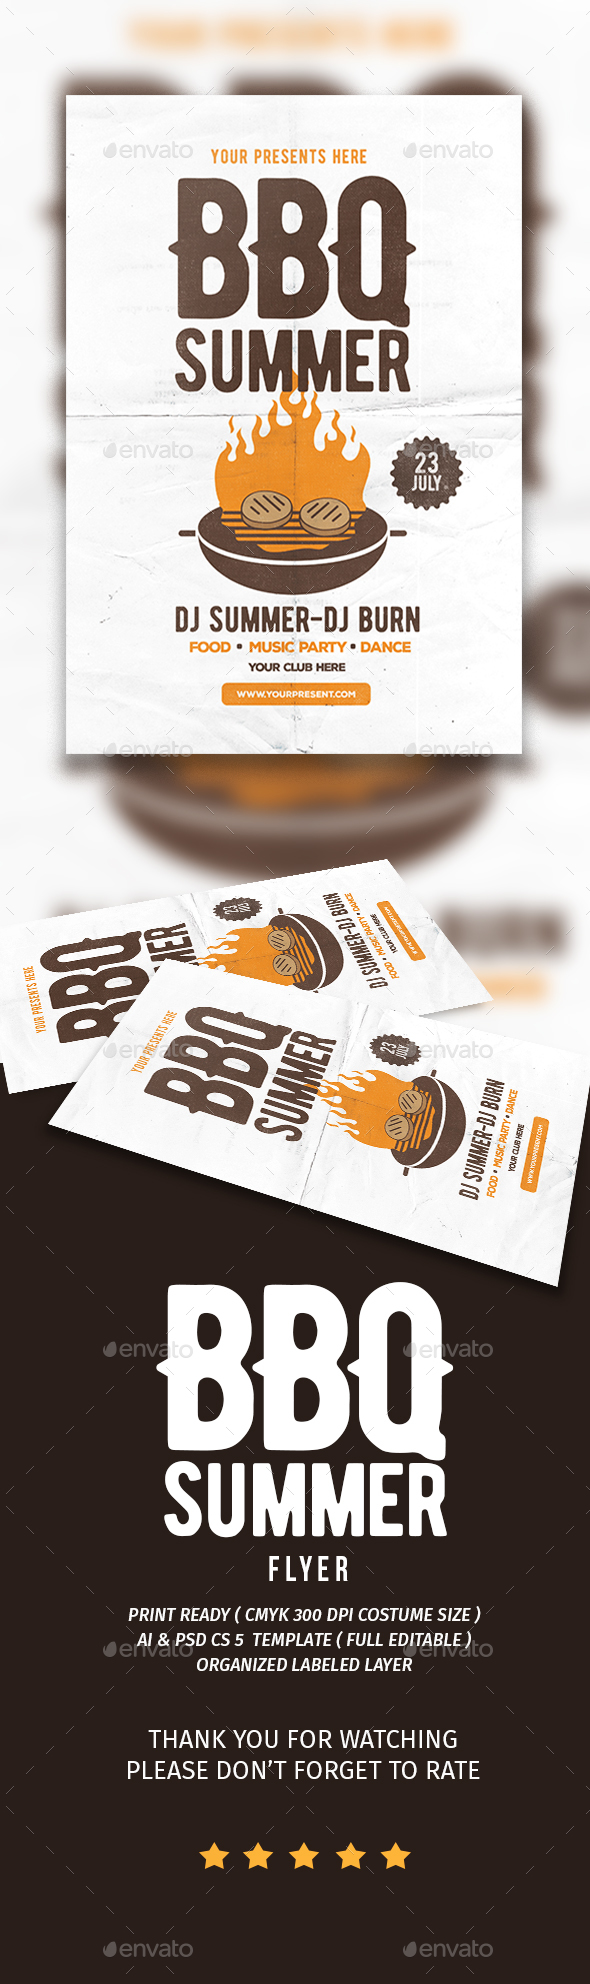 BBQ Summer Flyer - Flyers Print Templates